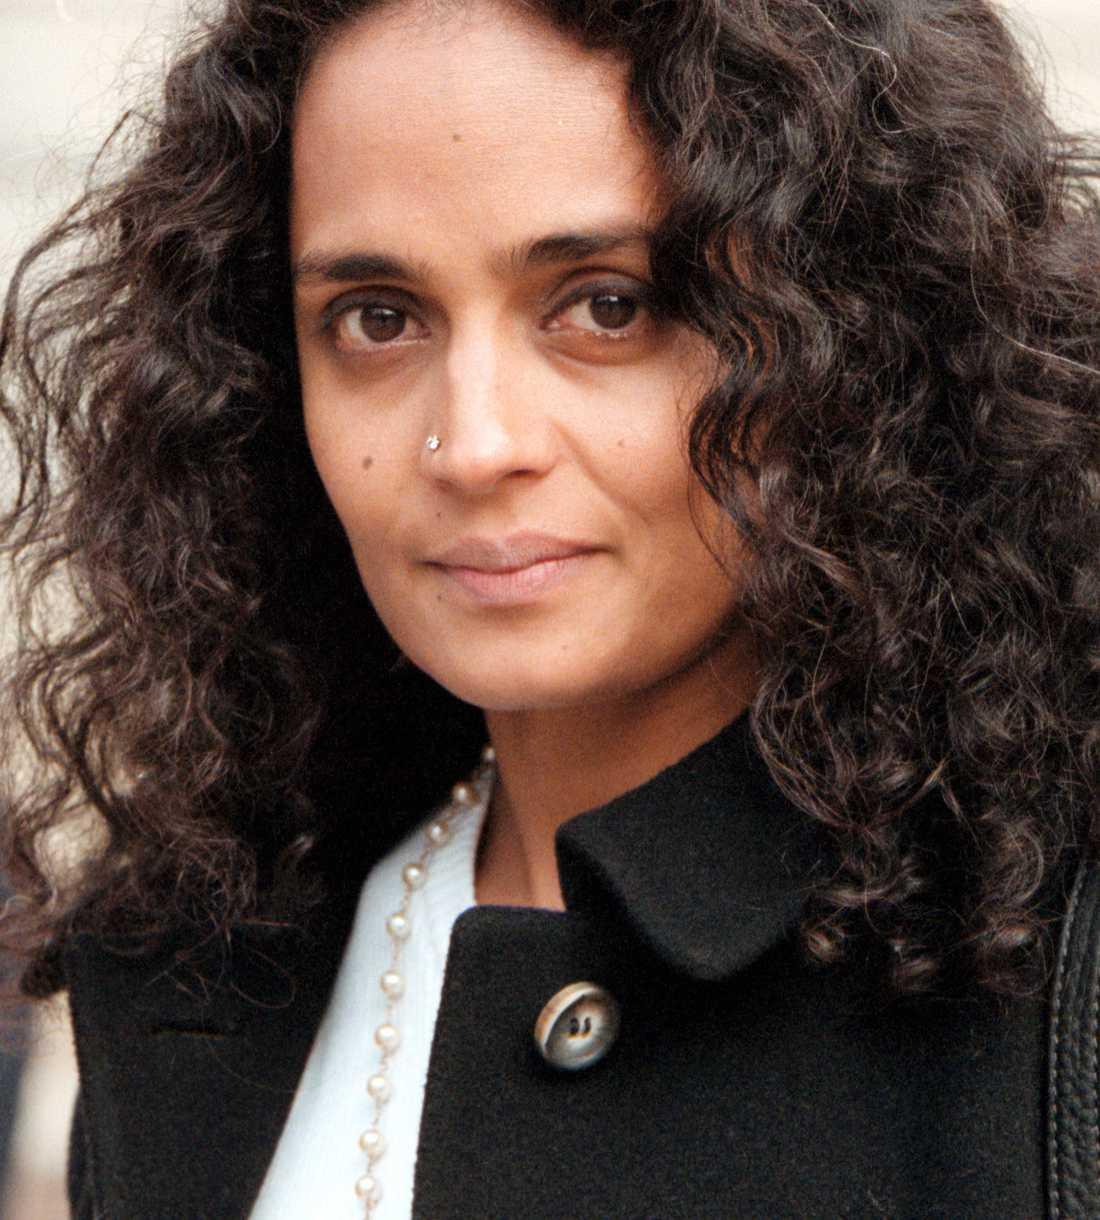 Författarinnan Arundhati Roy.